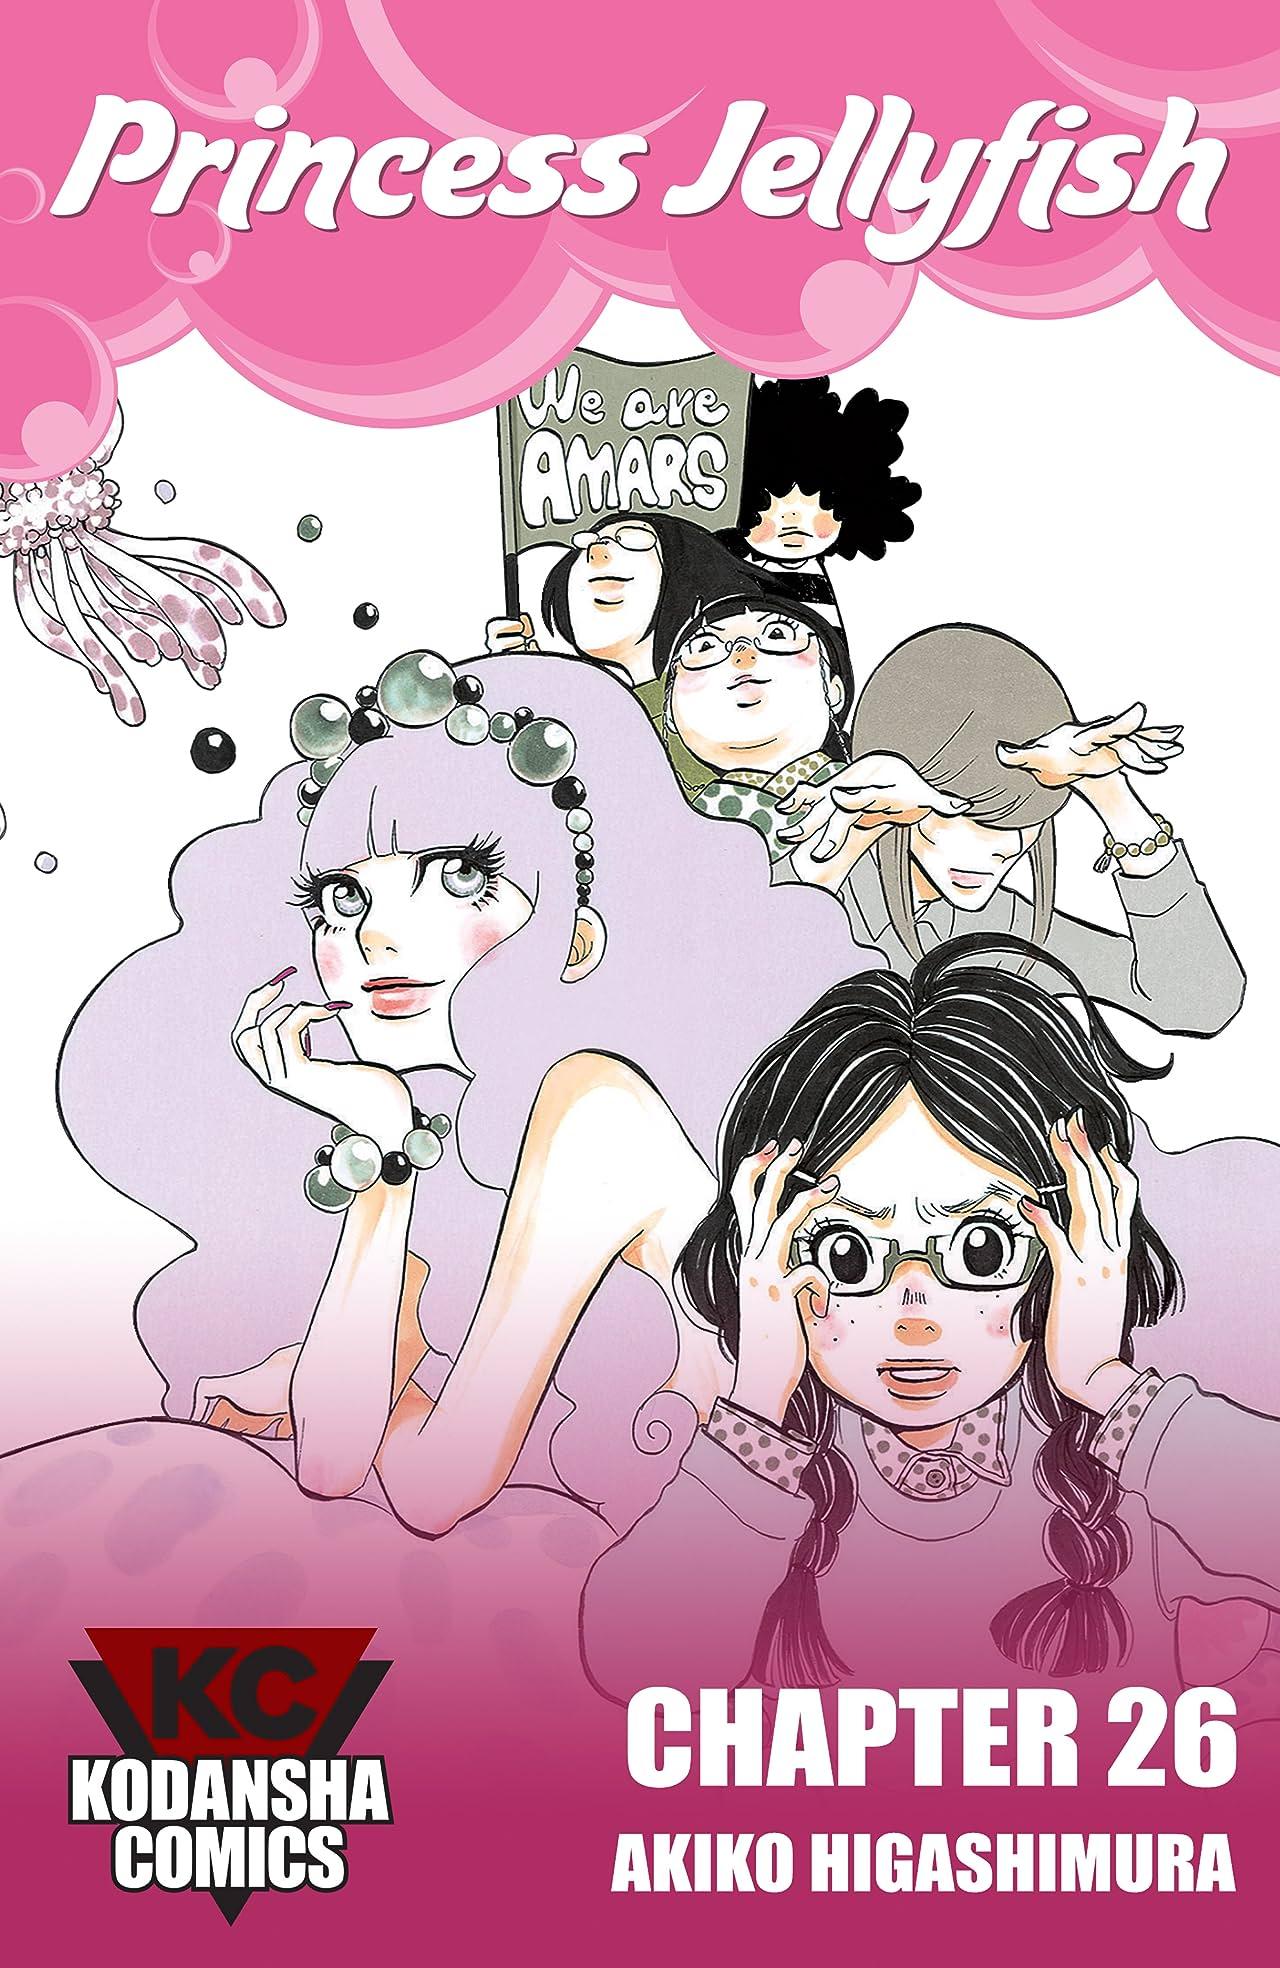 Princess Jellyfish #26